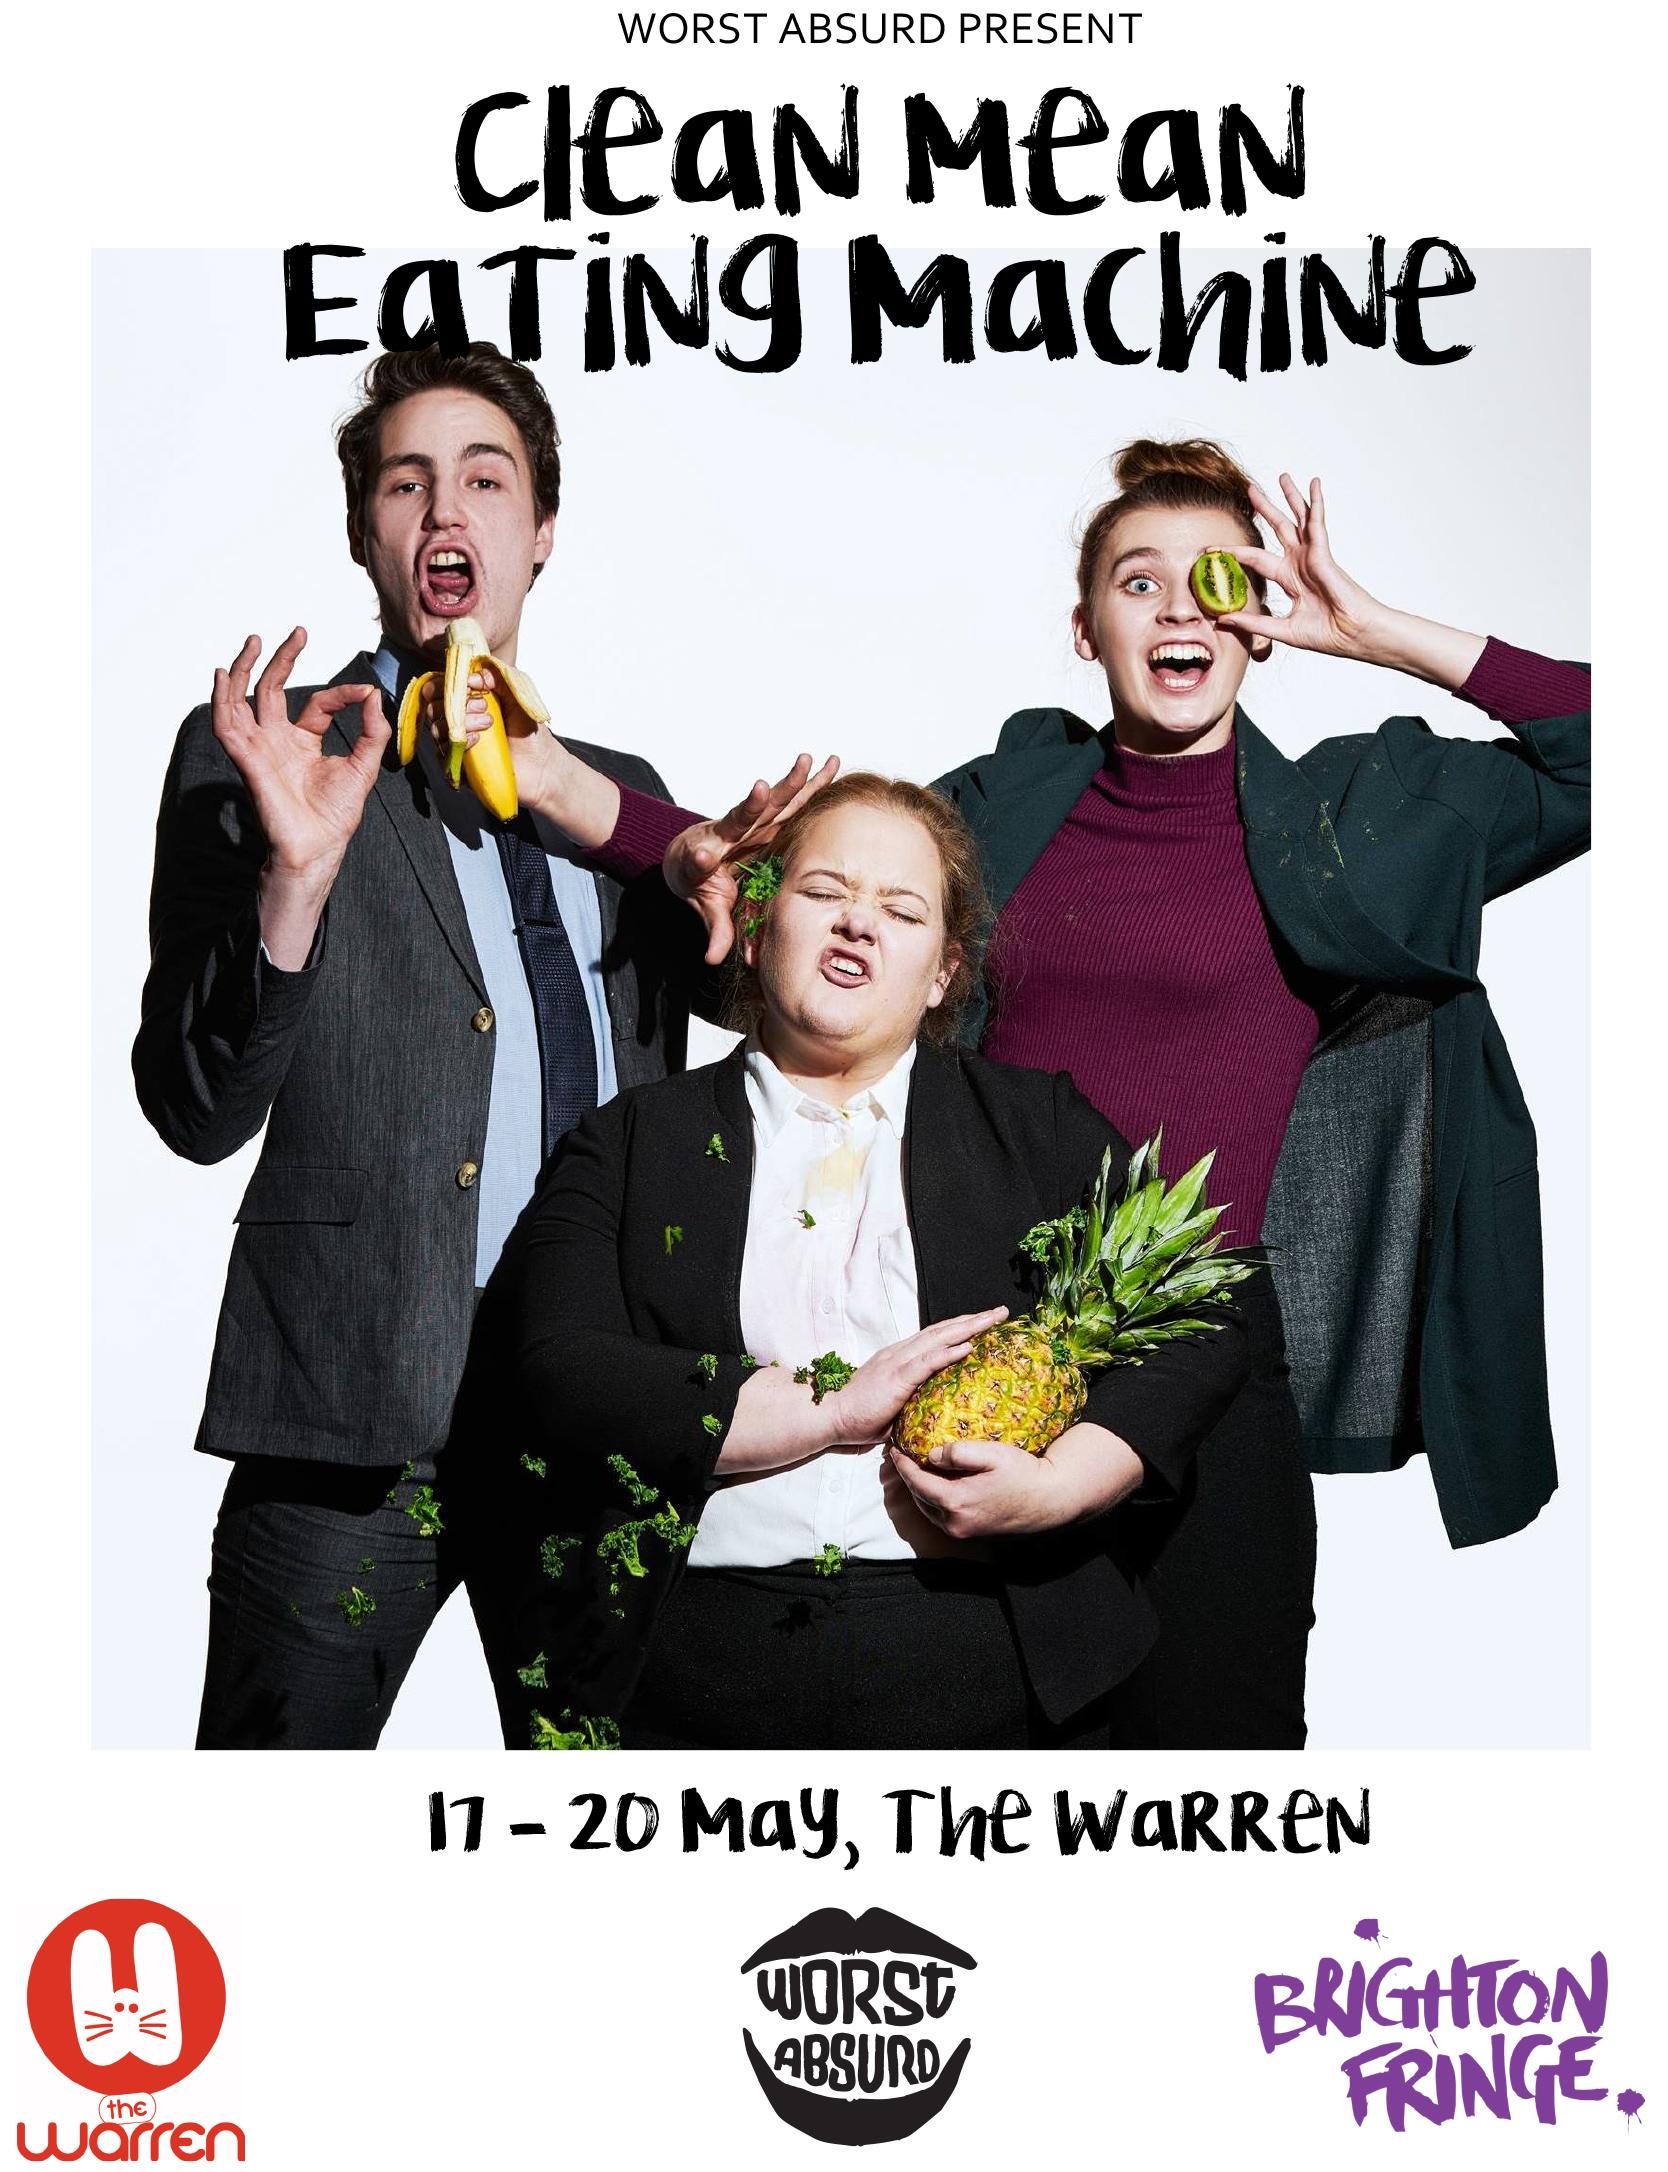 Worst_Absurd_Clean_Mean_Eating_Machine_Brighton_Fringe_Photo_Danilo_Moroni.jpg